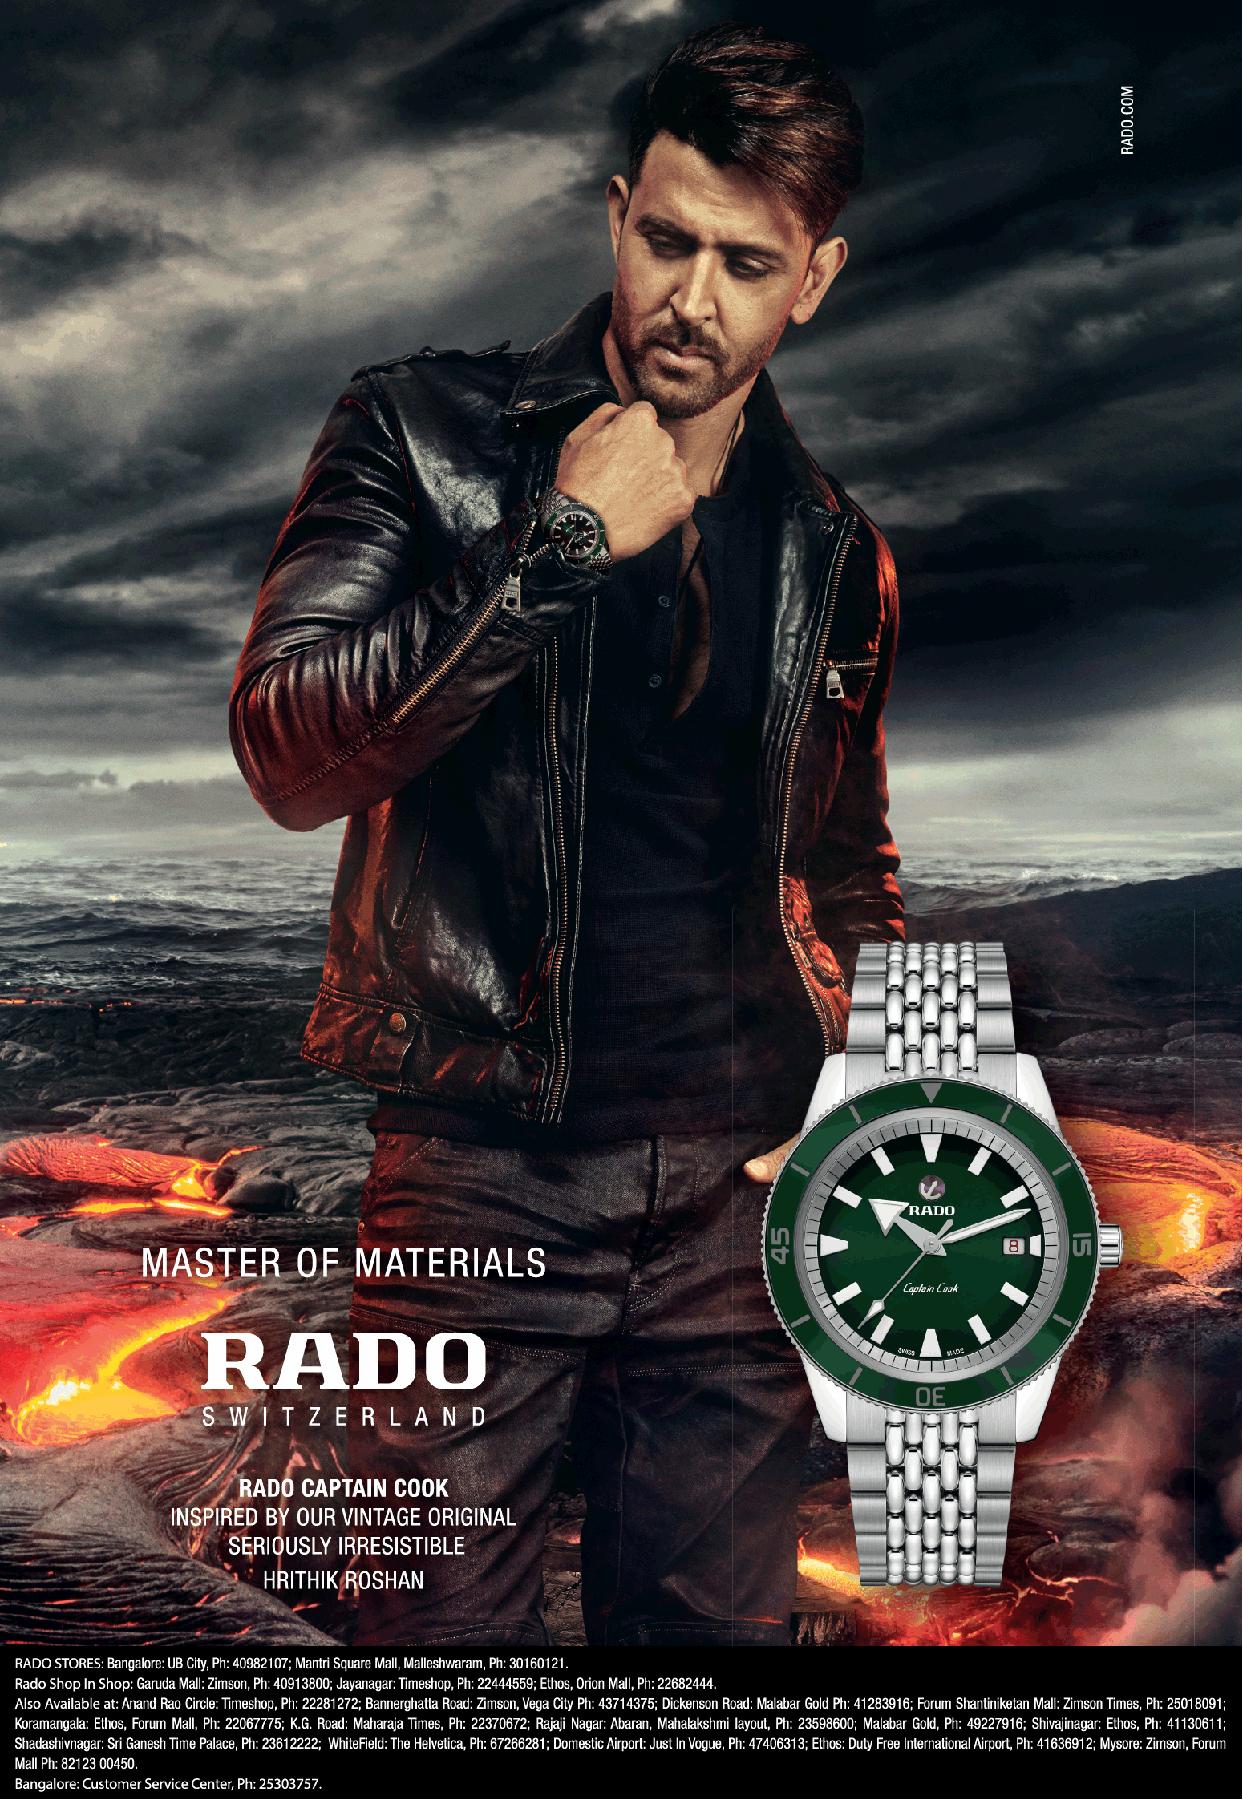 rado-sitzerland-master-of-materials-rado-captain-cook-ad-bangalore-times-09-06-2019.png